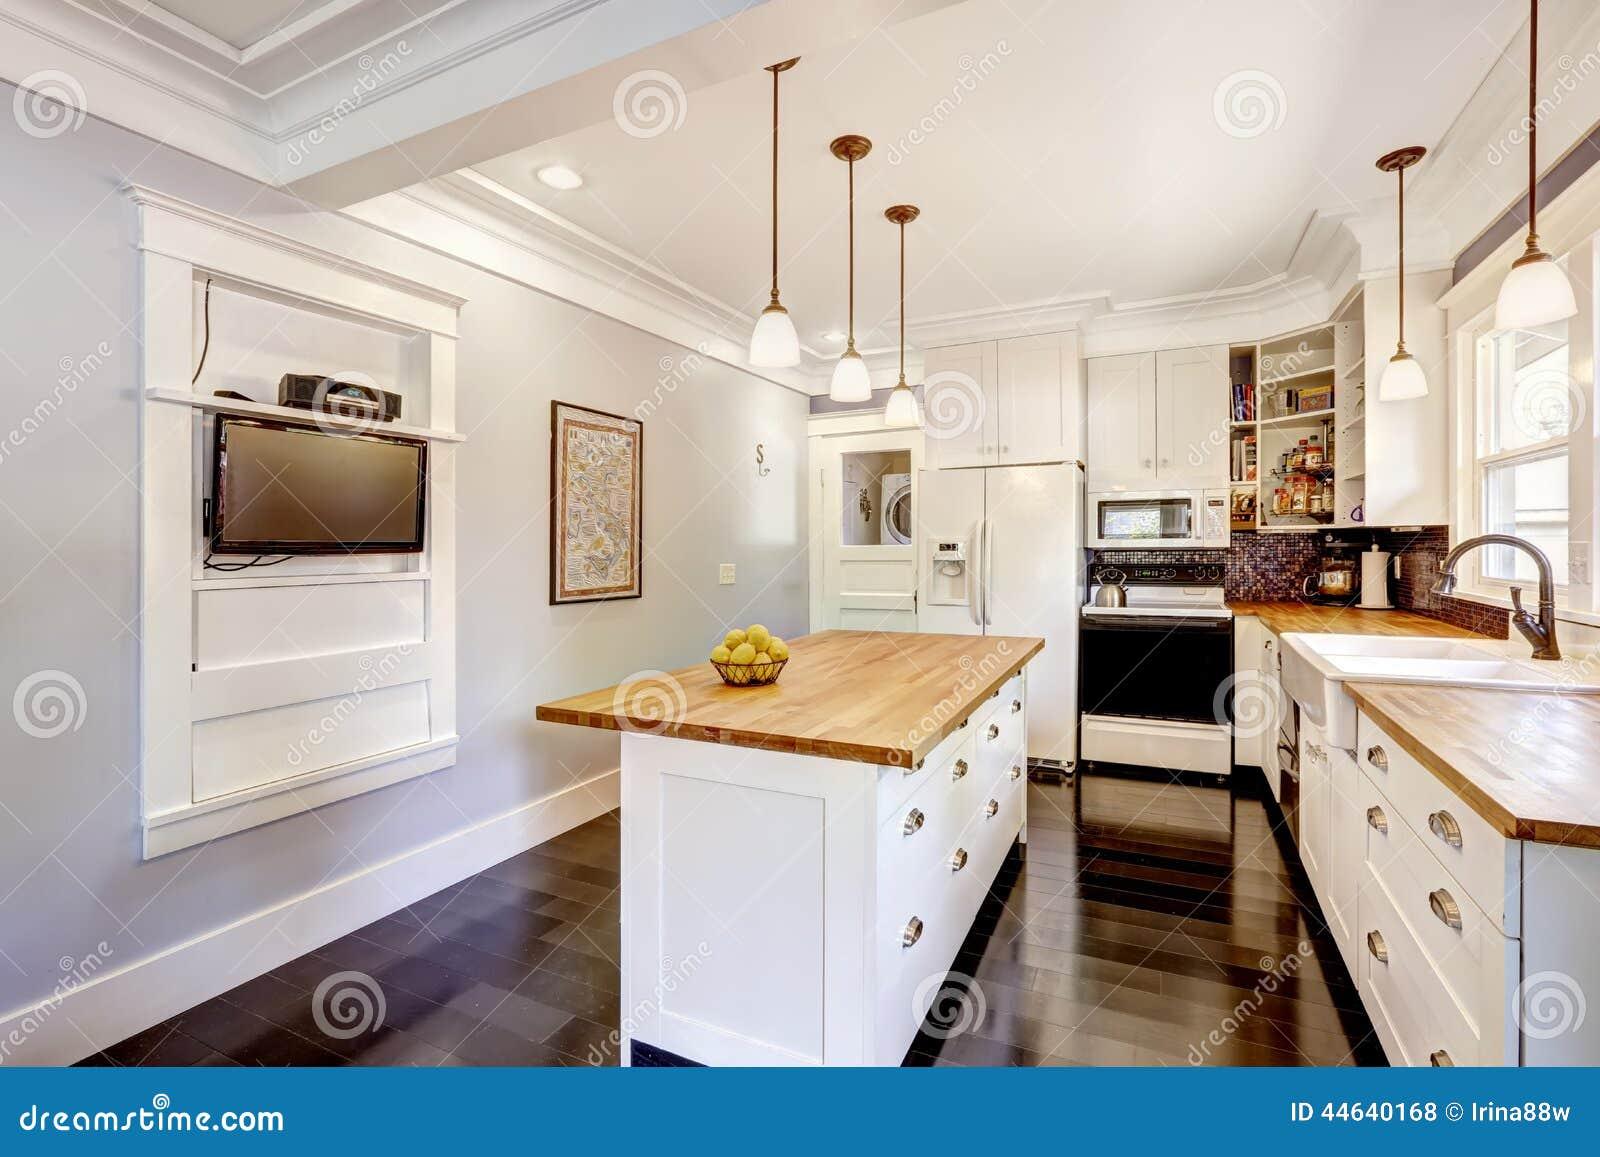 Keuken Eiland Ideas : Keuken ikea garantie. Keuken bar krukken ...